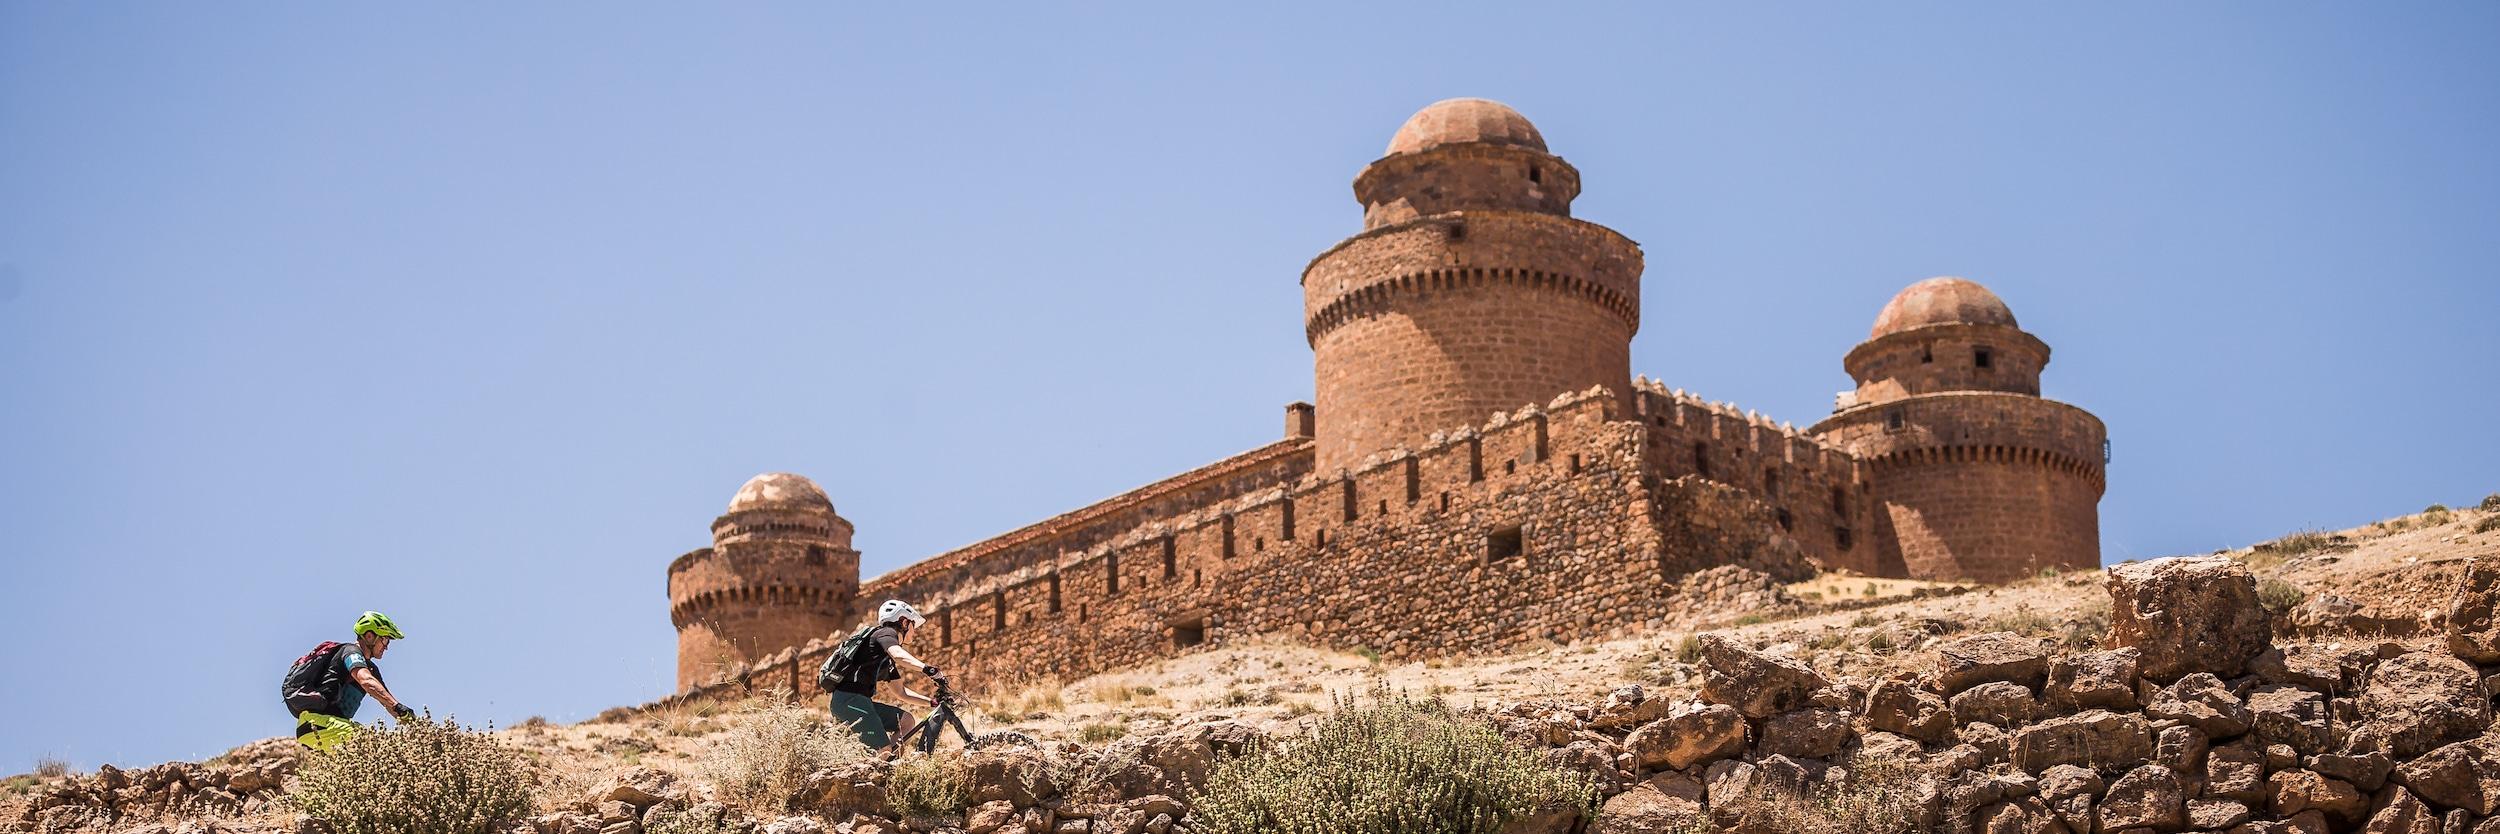 Mountain bike tours in Europe, E-MTB Tour Spain